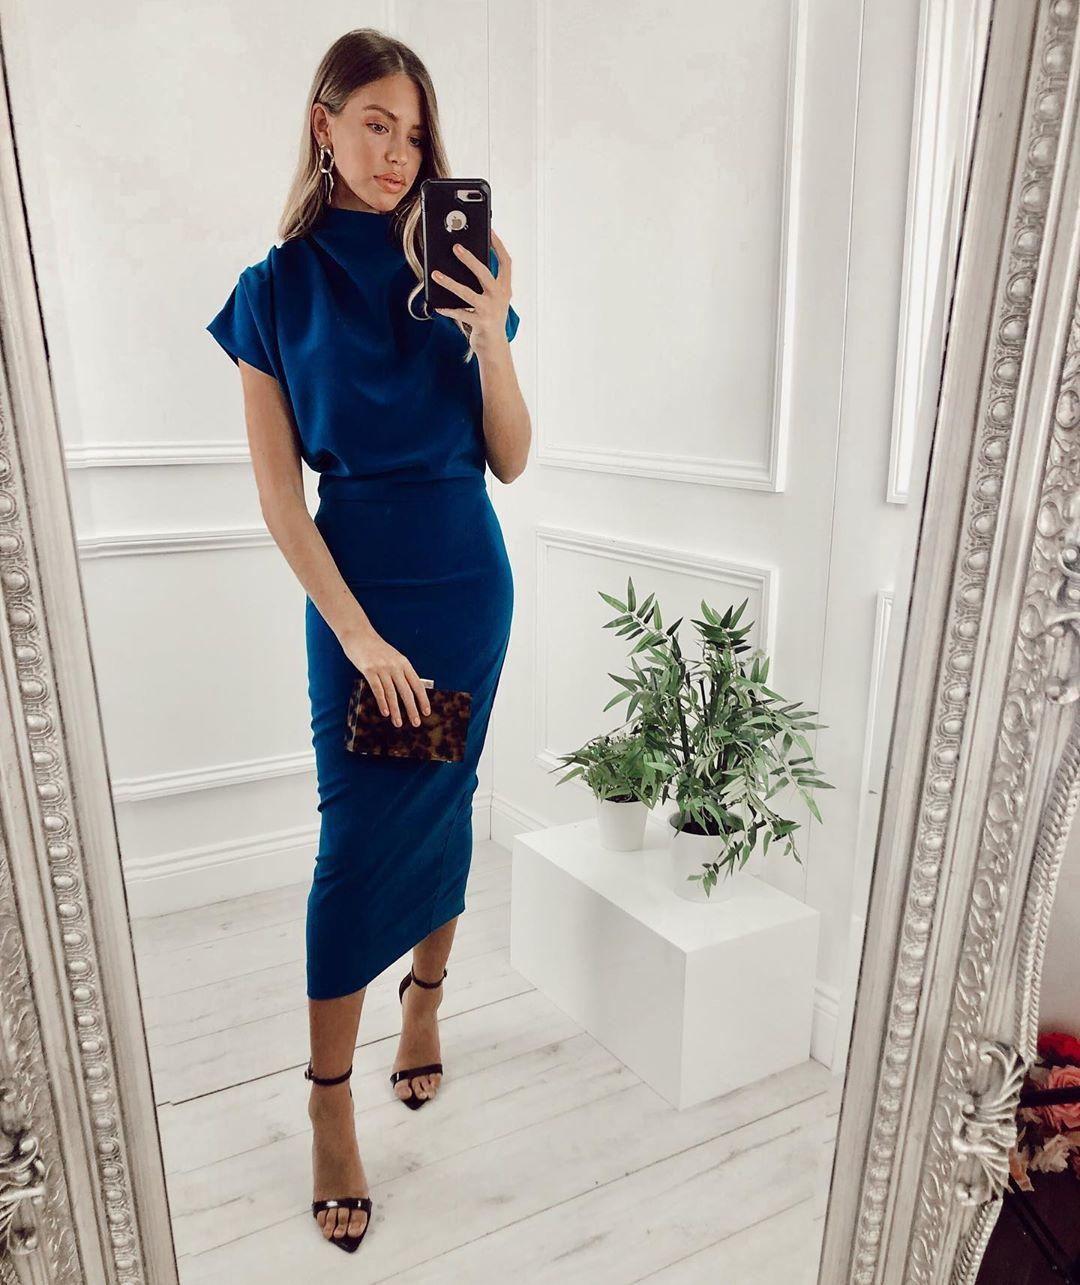 Model wears a high neck midi dress